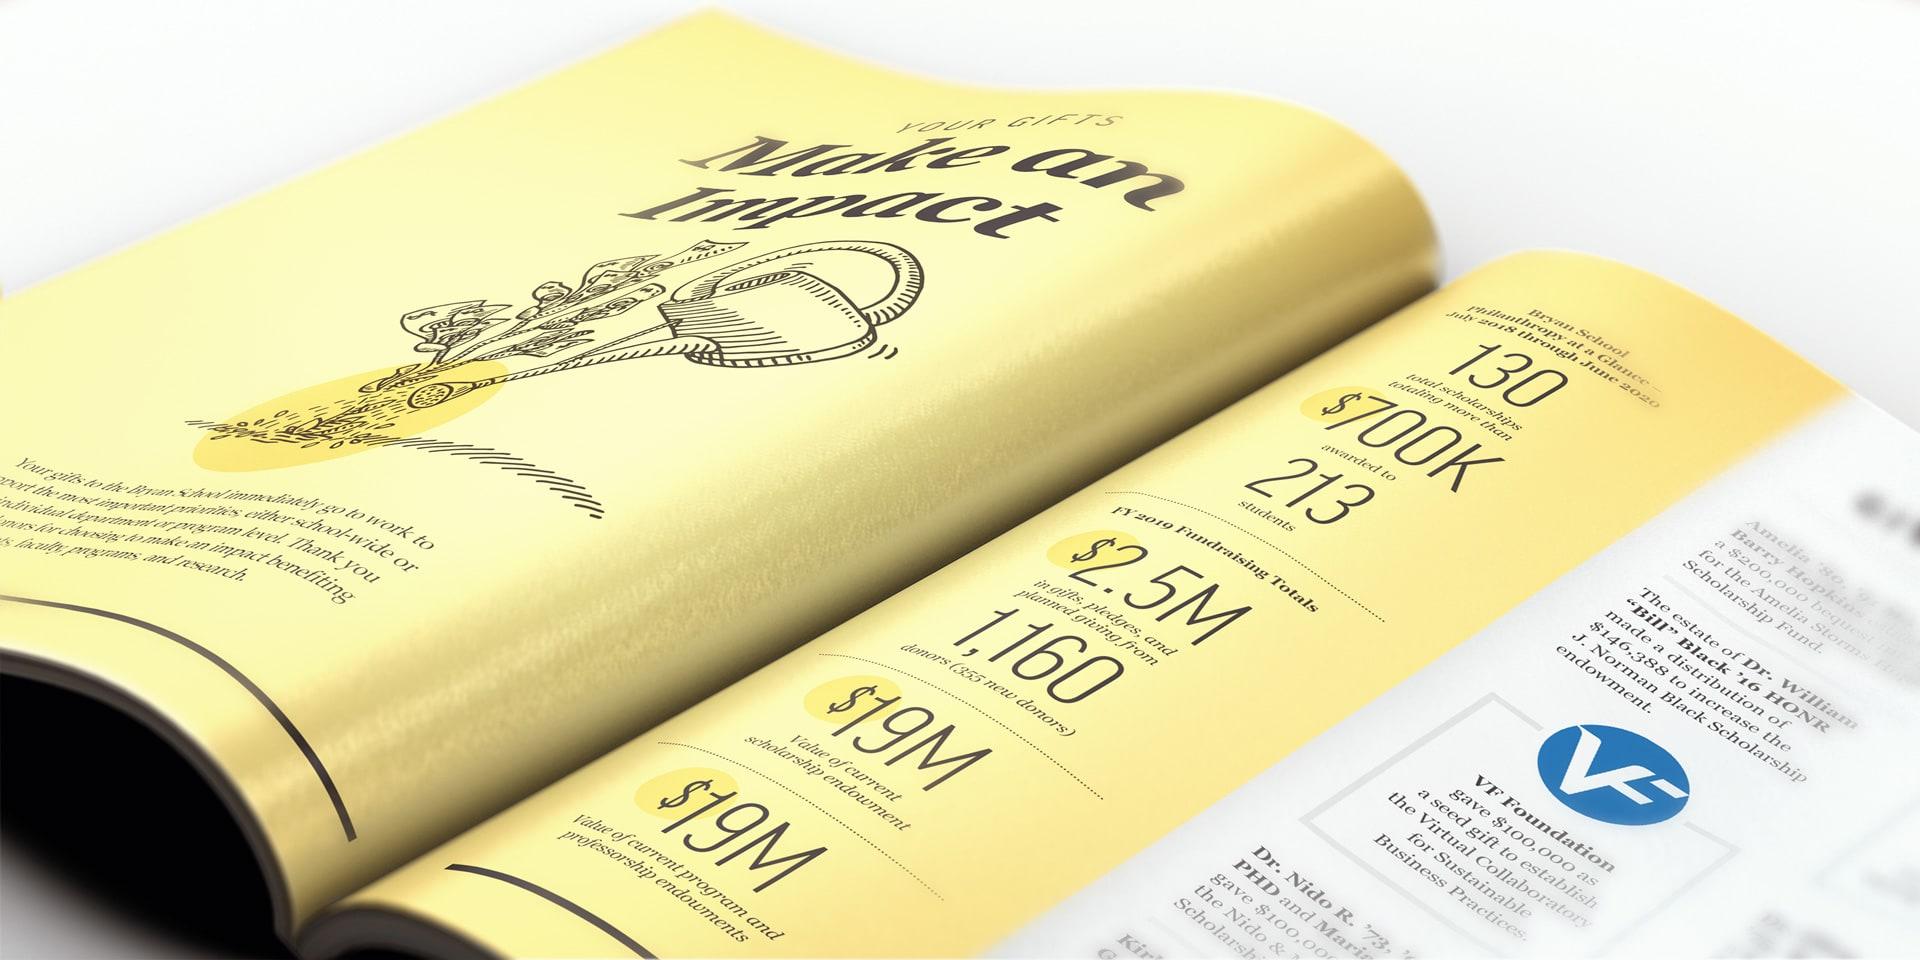 print magazine inner spread closeup